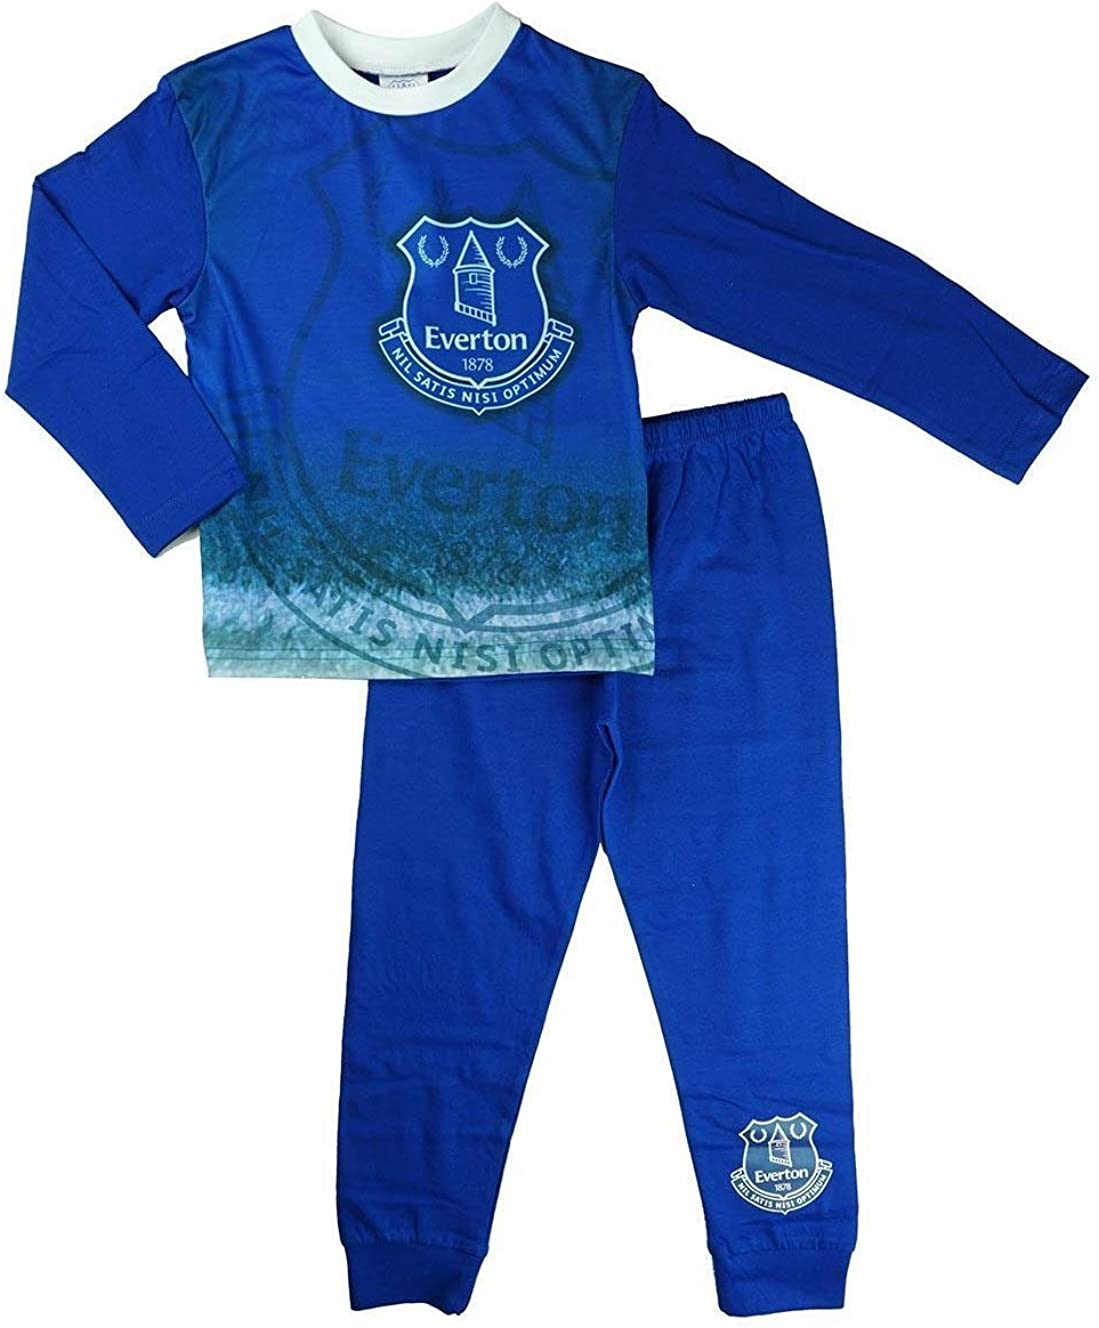 Everton FC Official Soccer Gift Boys Short Pajamas